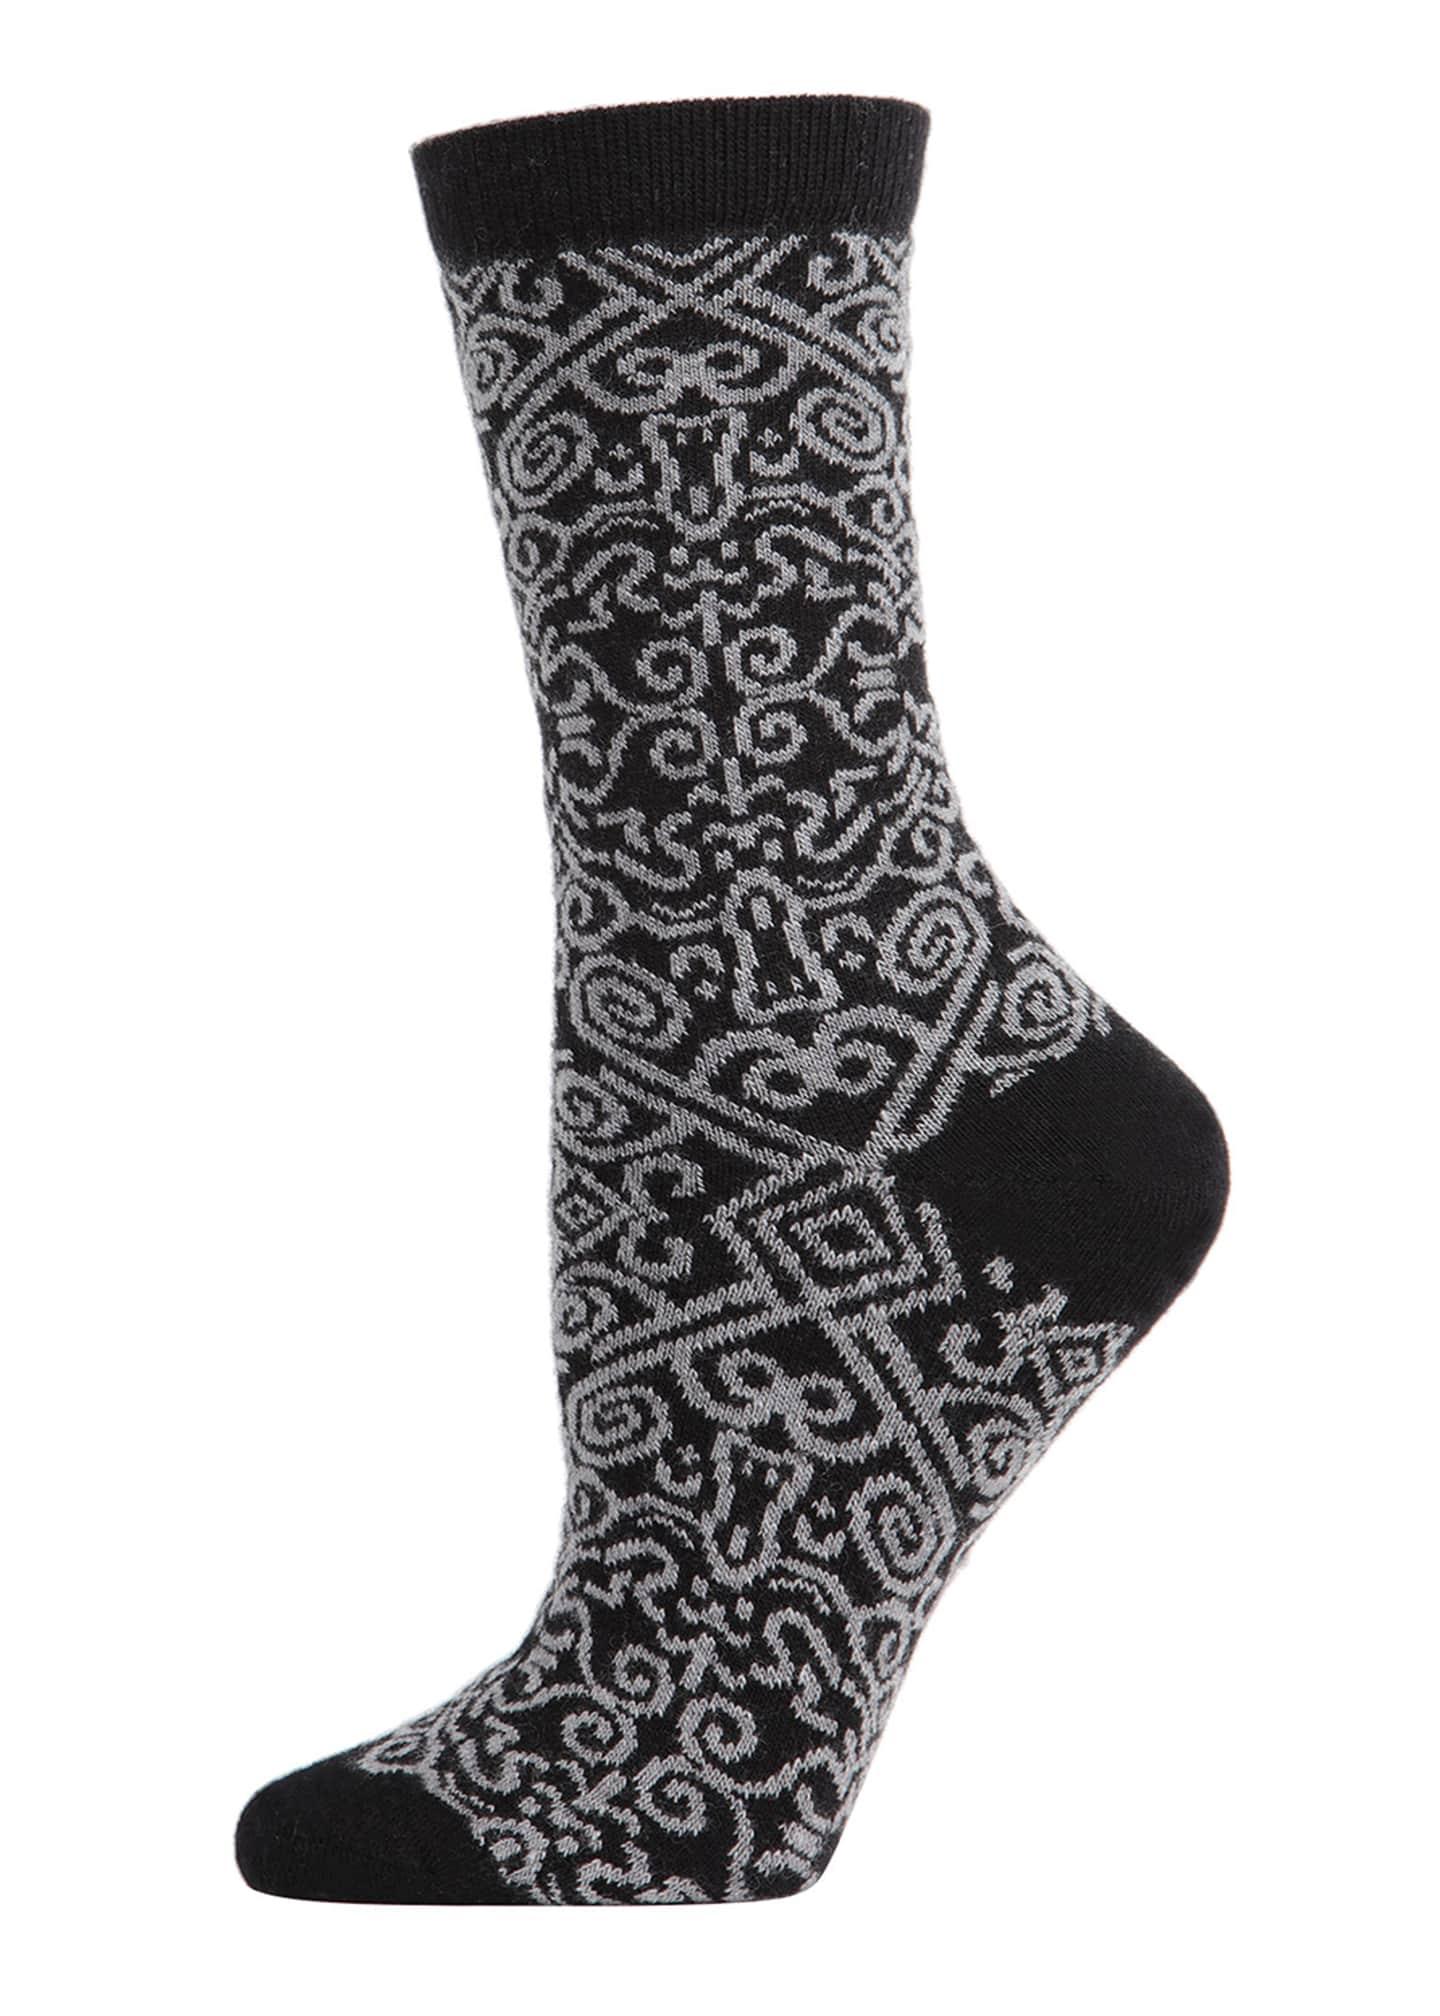 Natori 2-Pack Textile & Fretwork Crew Socks